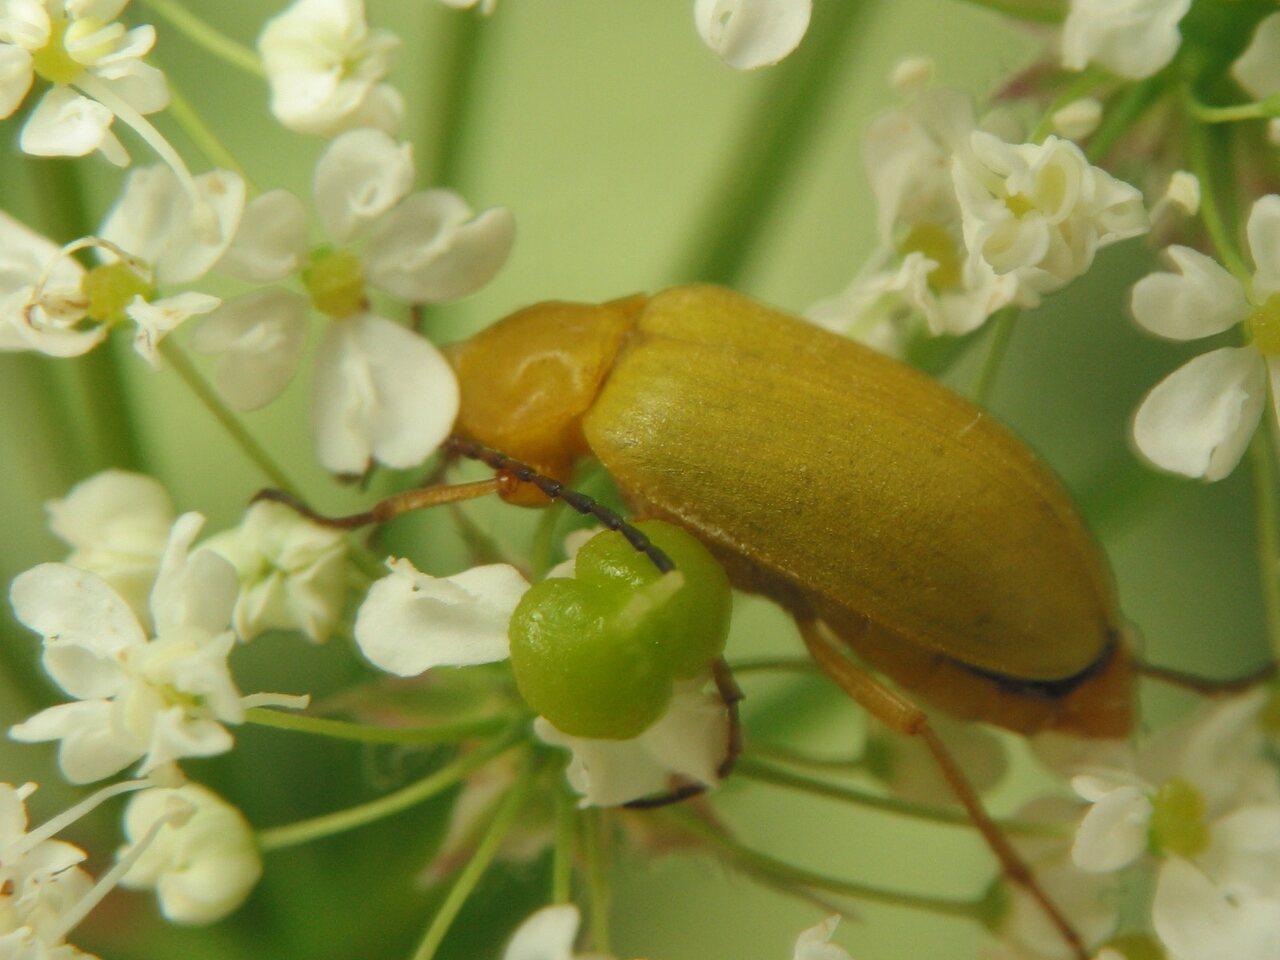 Cteniopus-flavus-3632.jpg